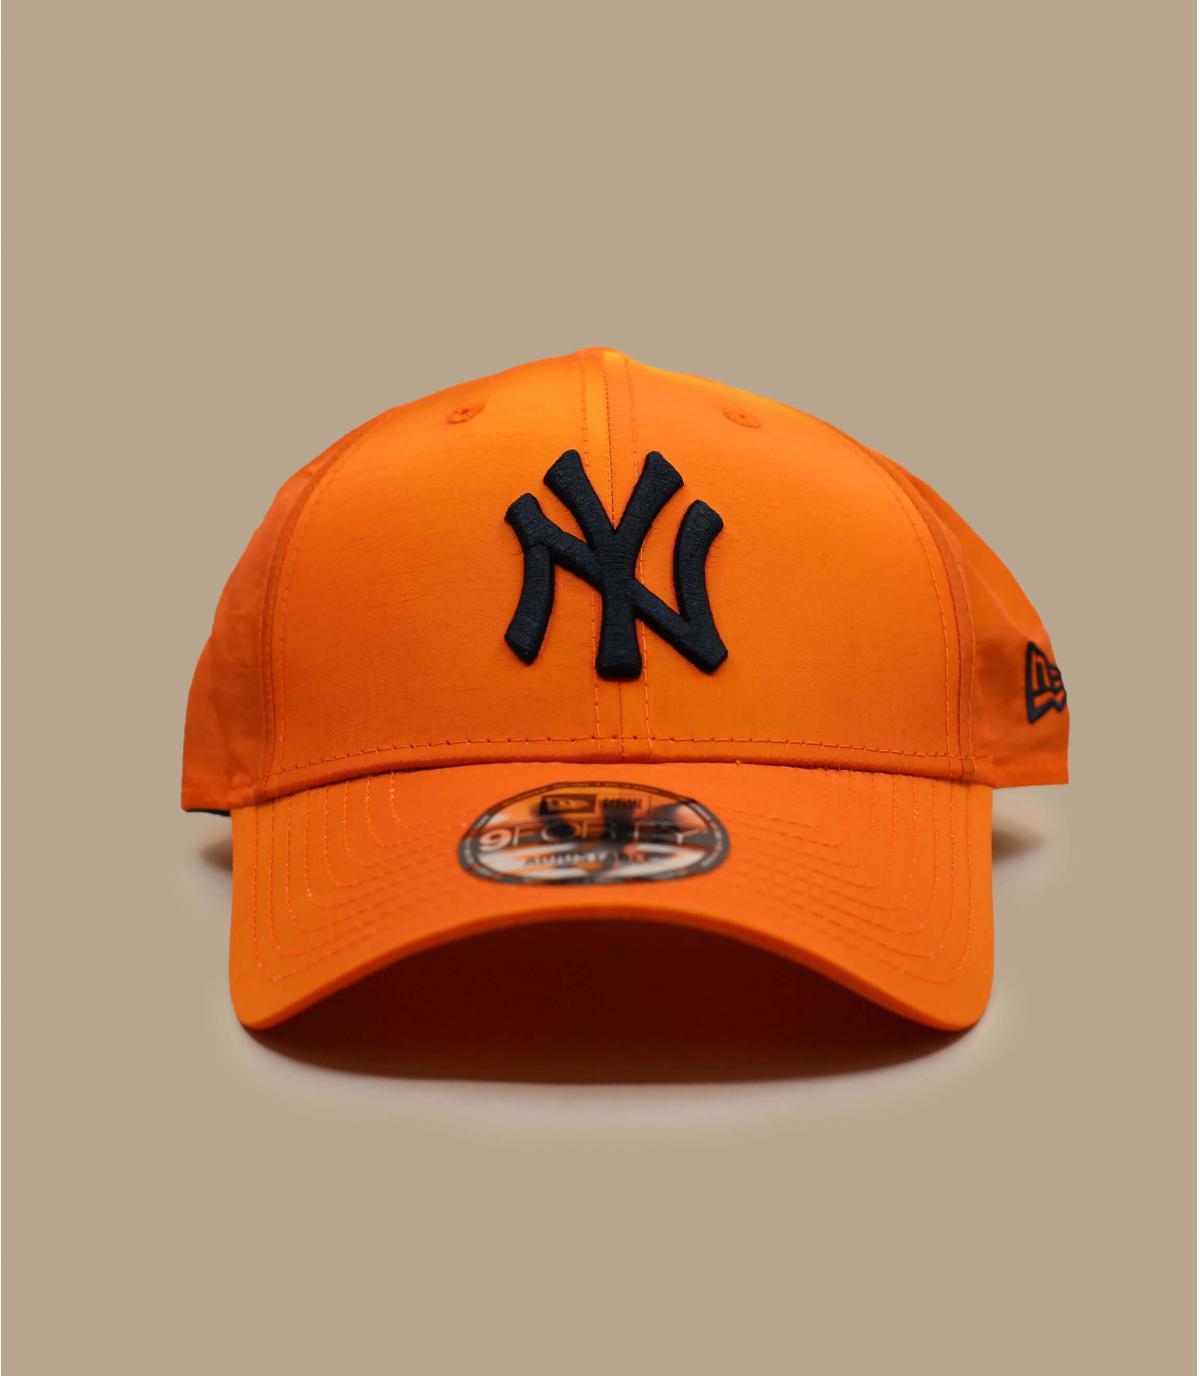 Iridescent orange NY cap